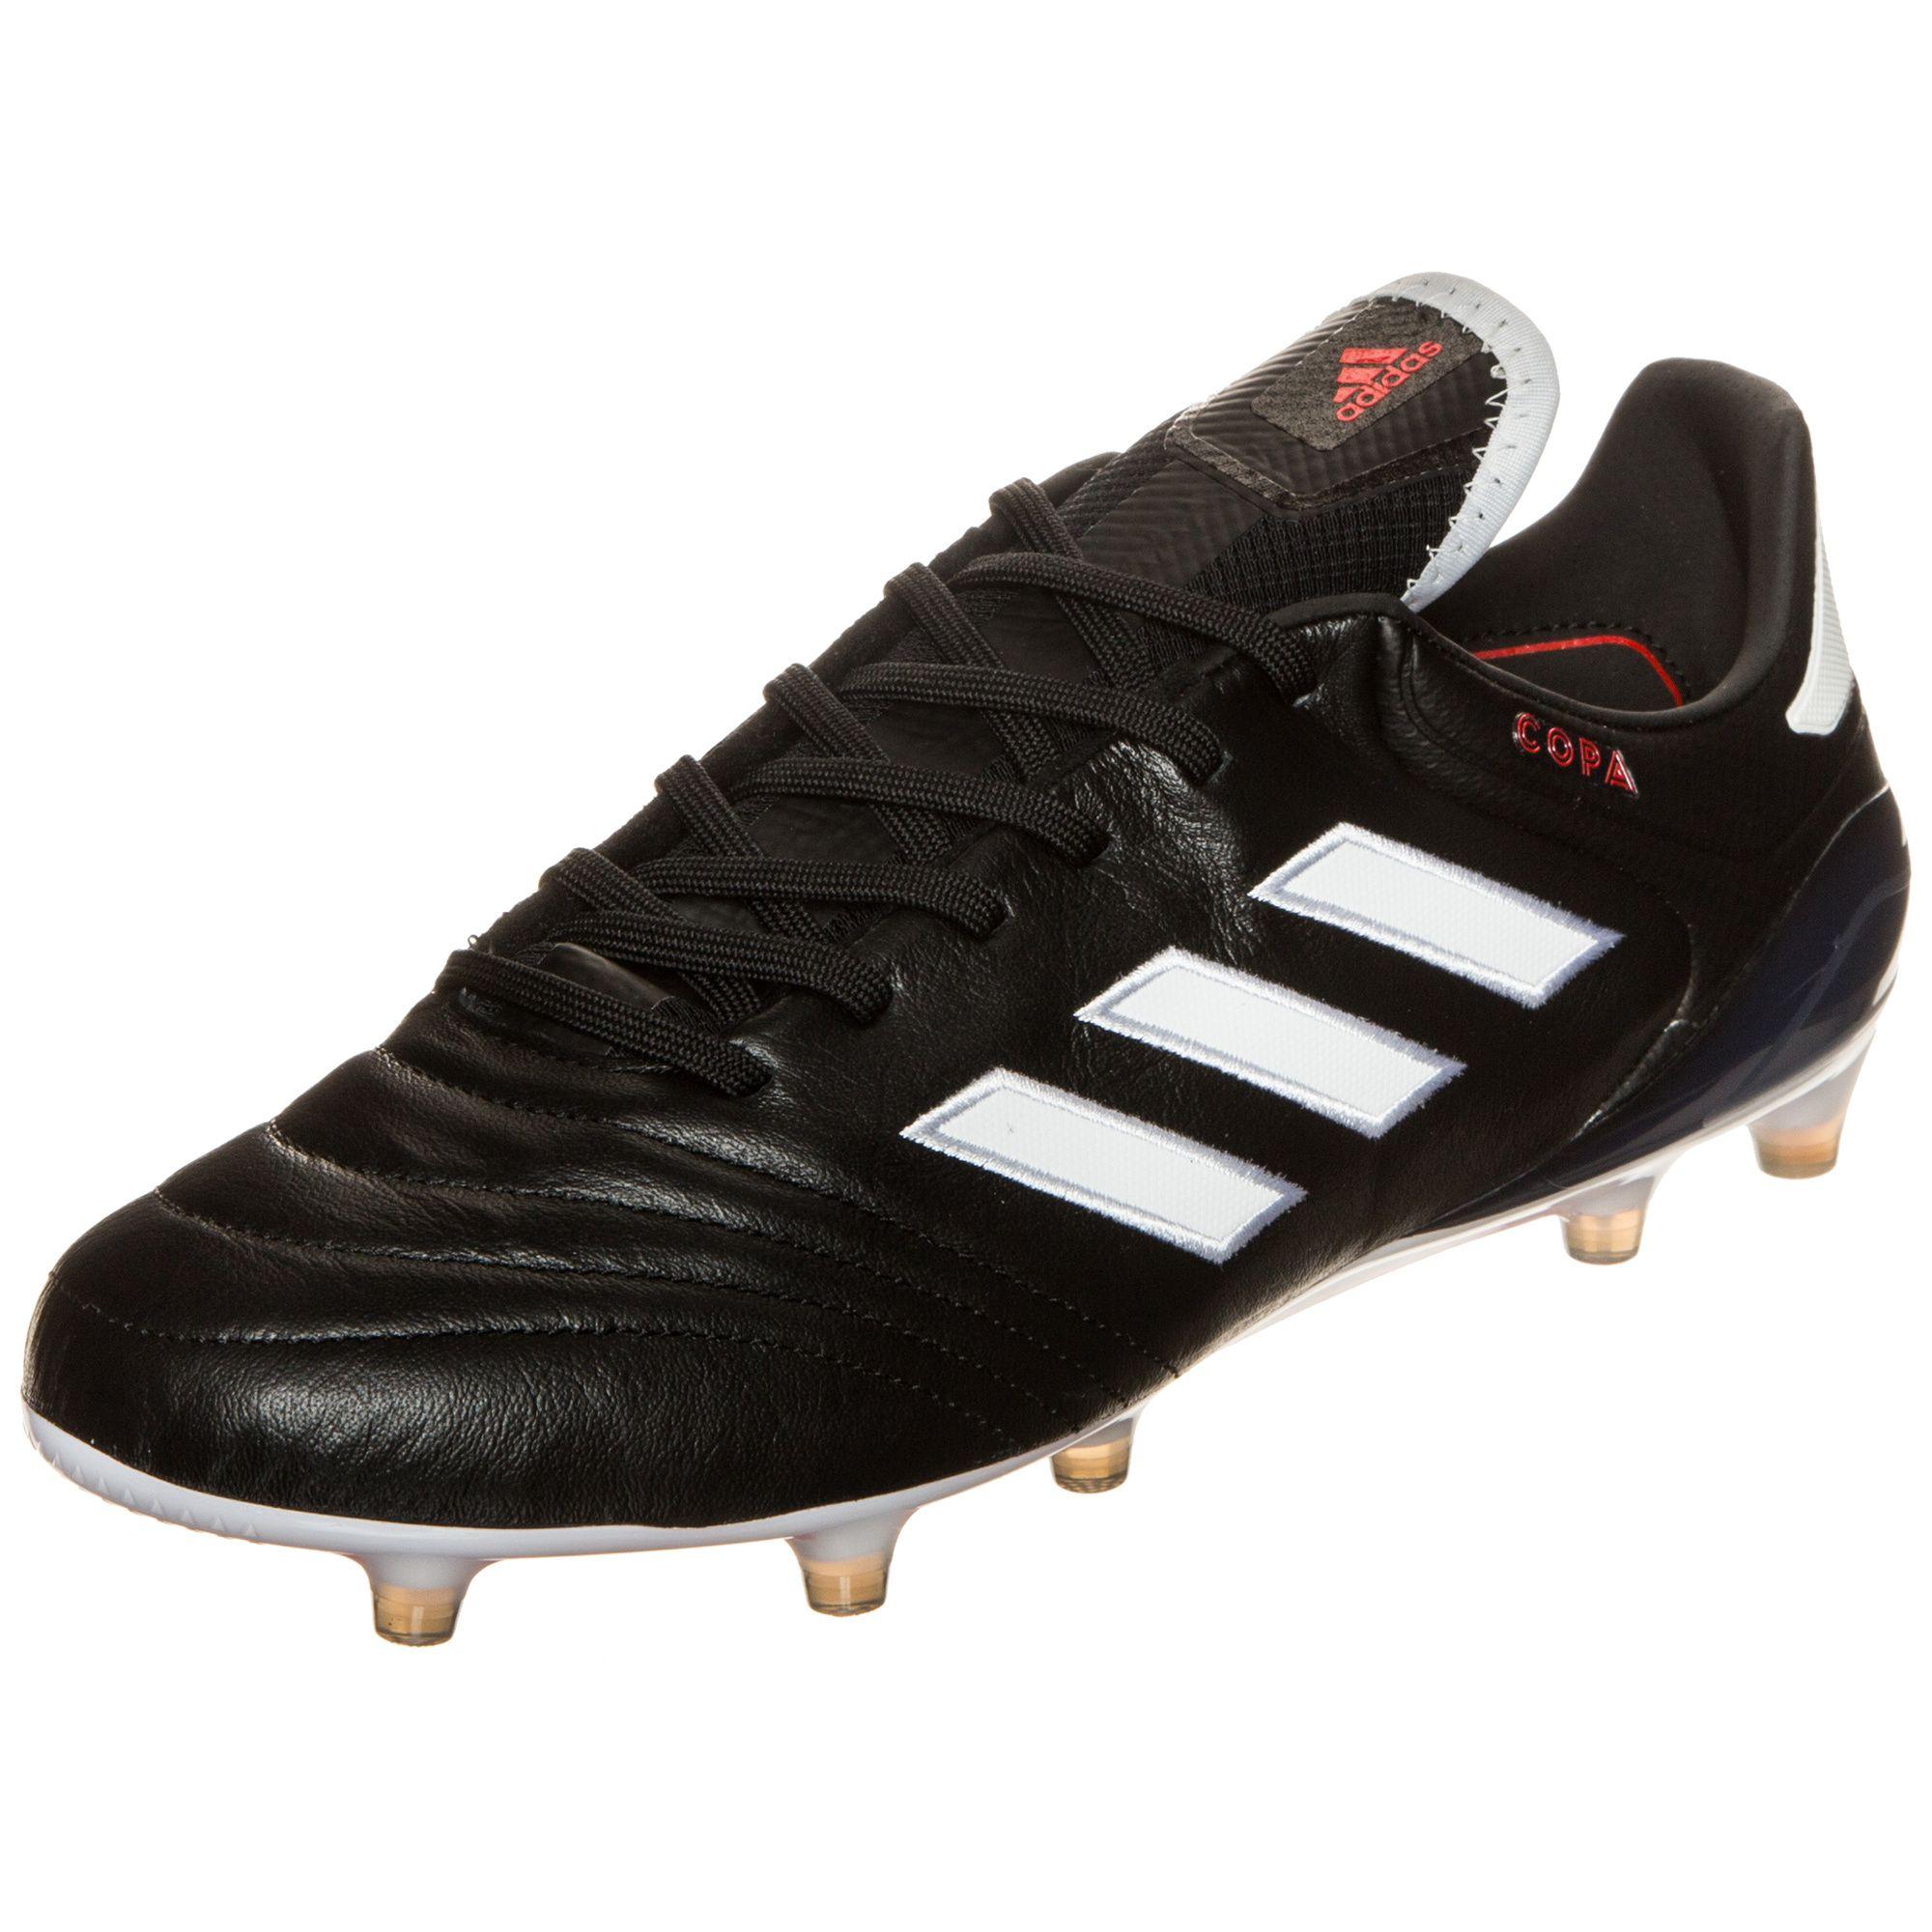 ADIDAS PERFORMANCE adidas Performance Copa 17.1 Chequered Black FG Fußballschuh Herren